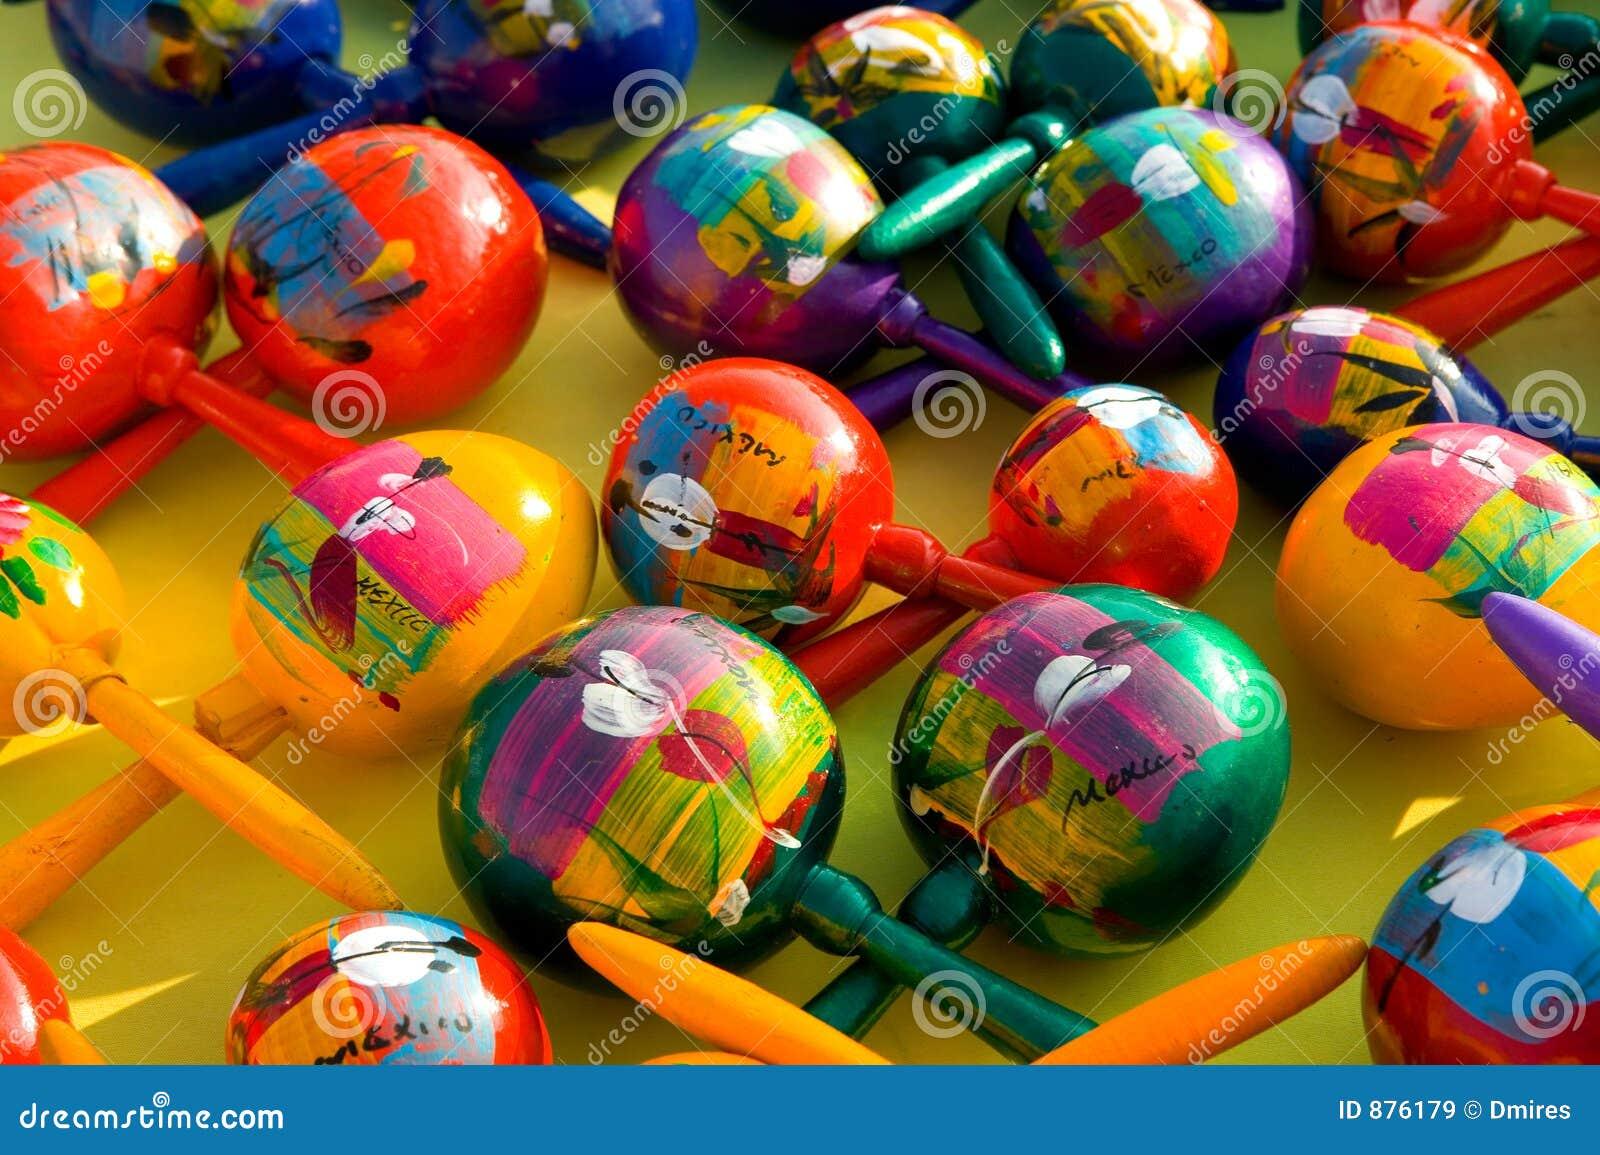 colorful maracas stock image image of display musical 876179